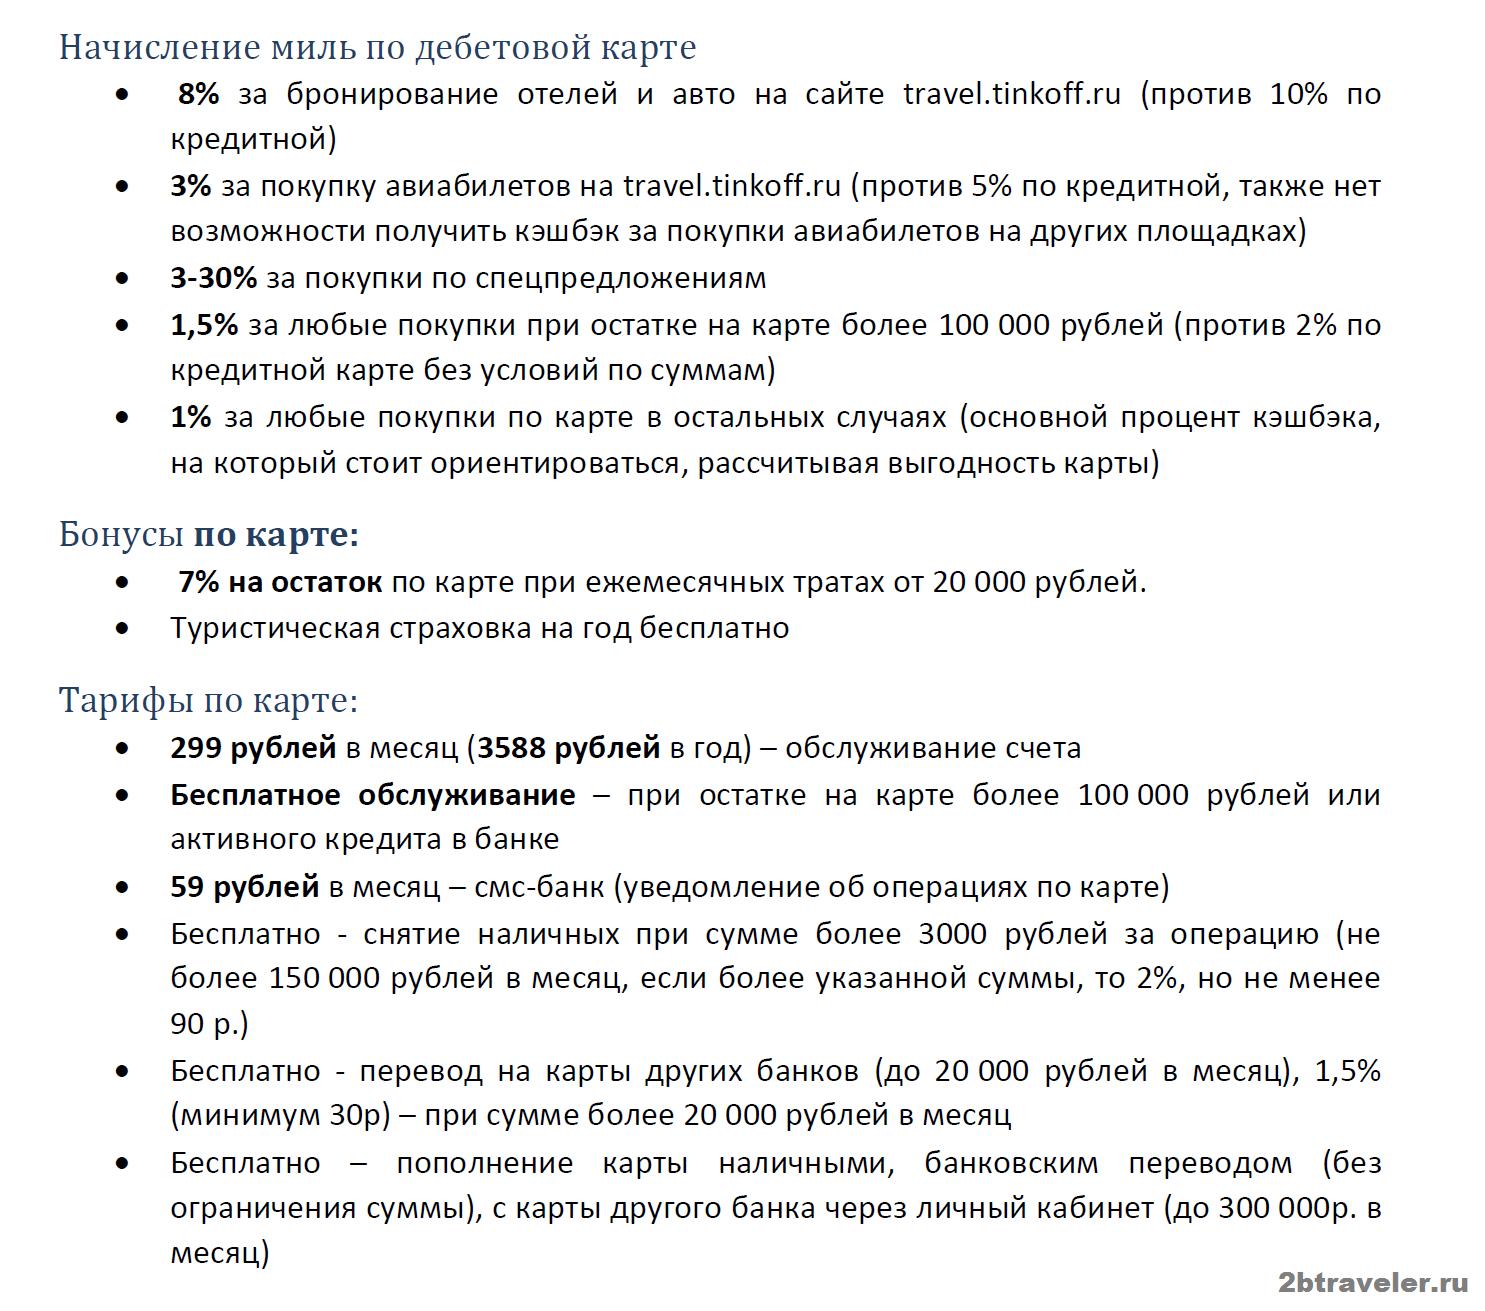 условия по дебетовой карте тинькофф все авиалинии